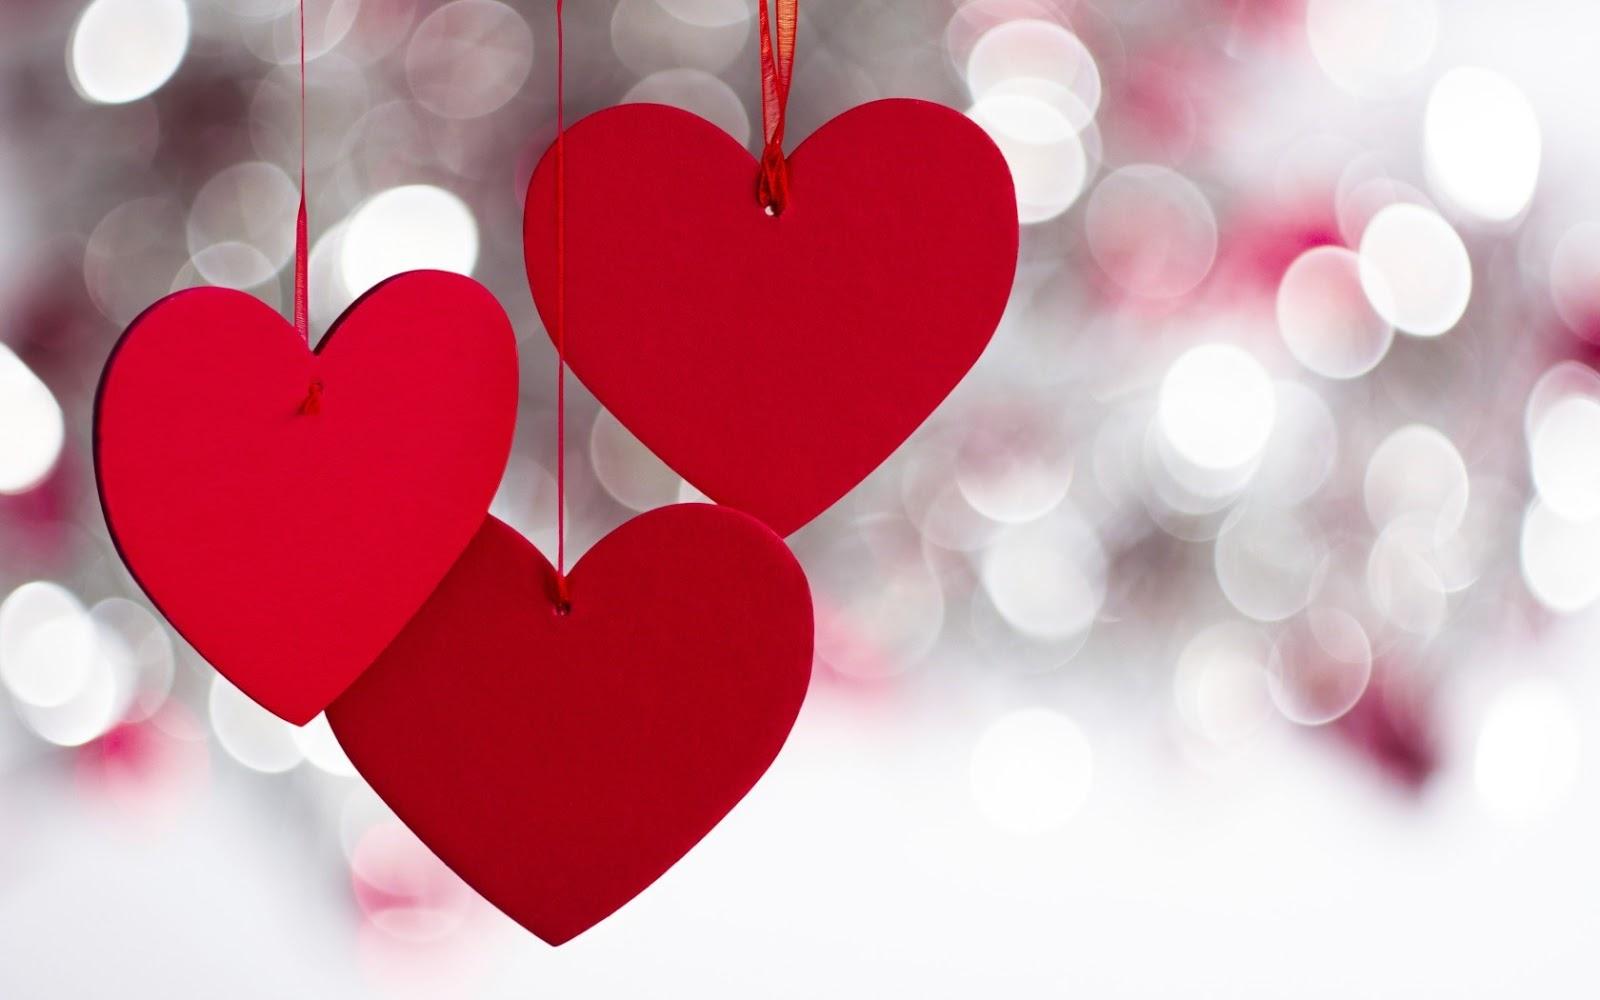 3 lovely red heart wallpaper beautiful